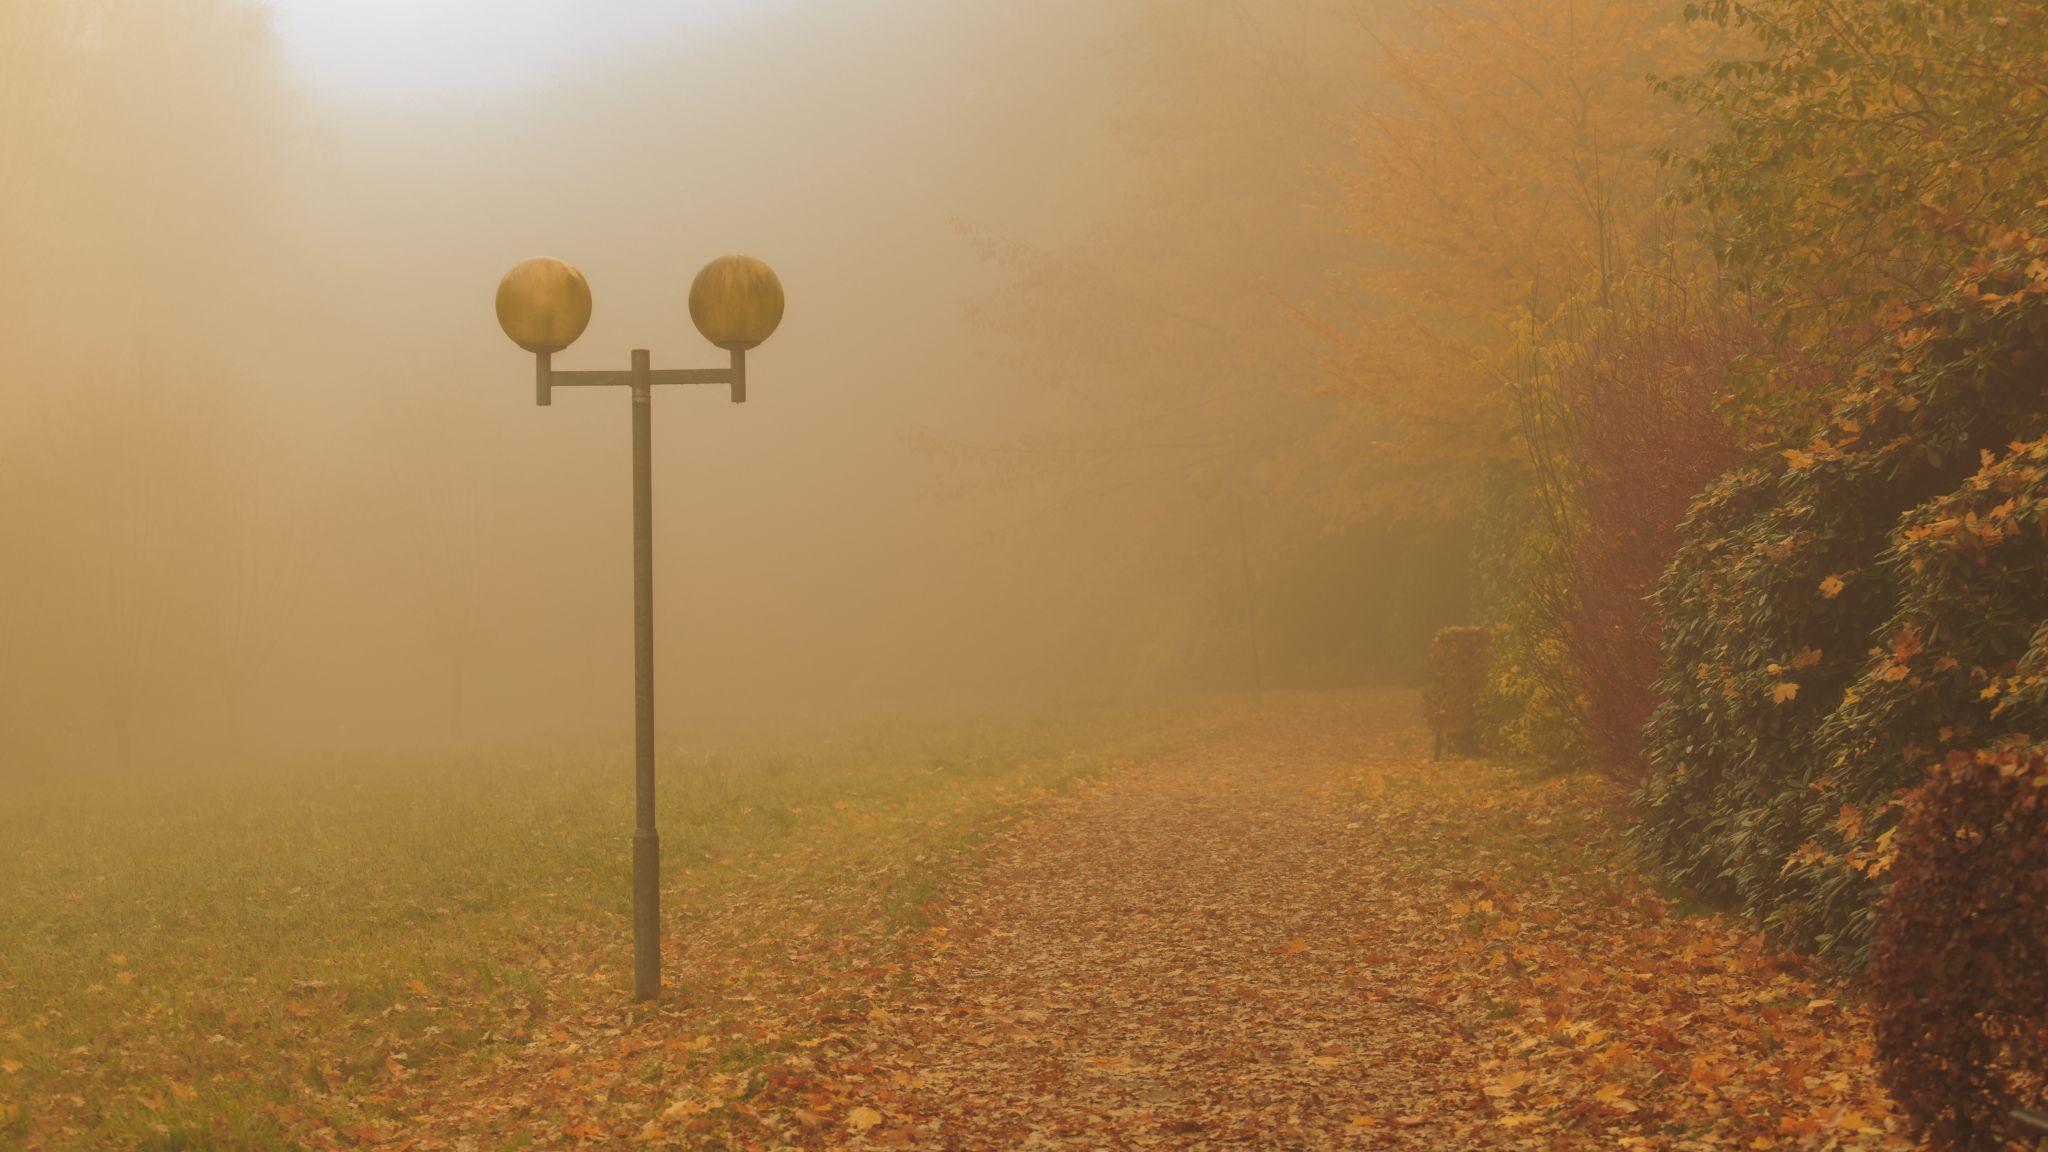 Bad Fallingbostel, Kur Park, Germany